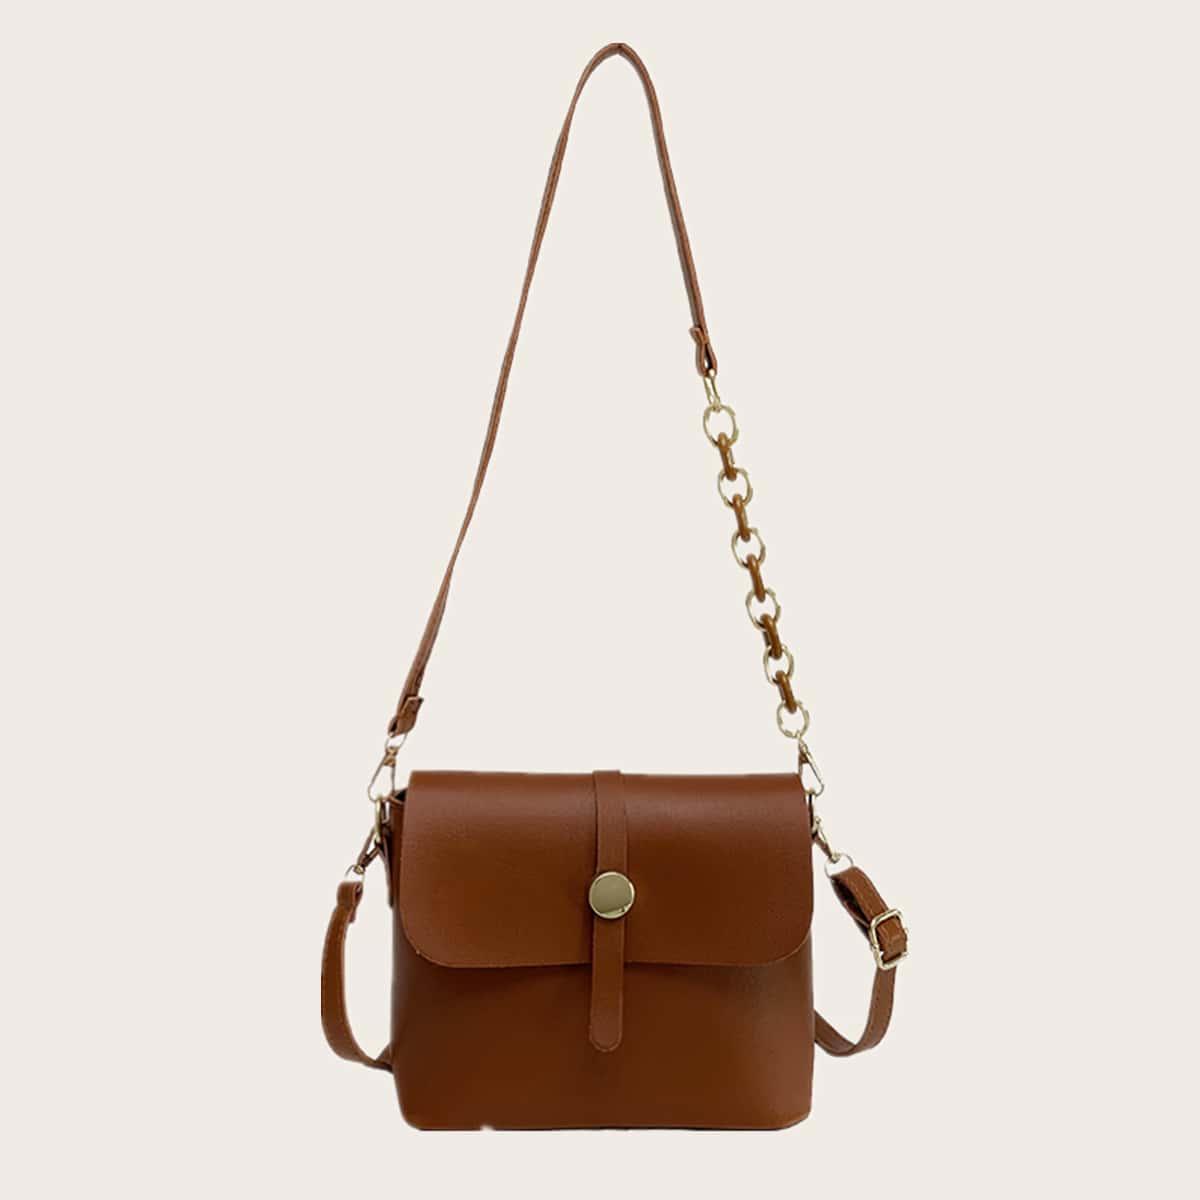 Минималистская сумка на плечо по цене 590